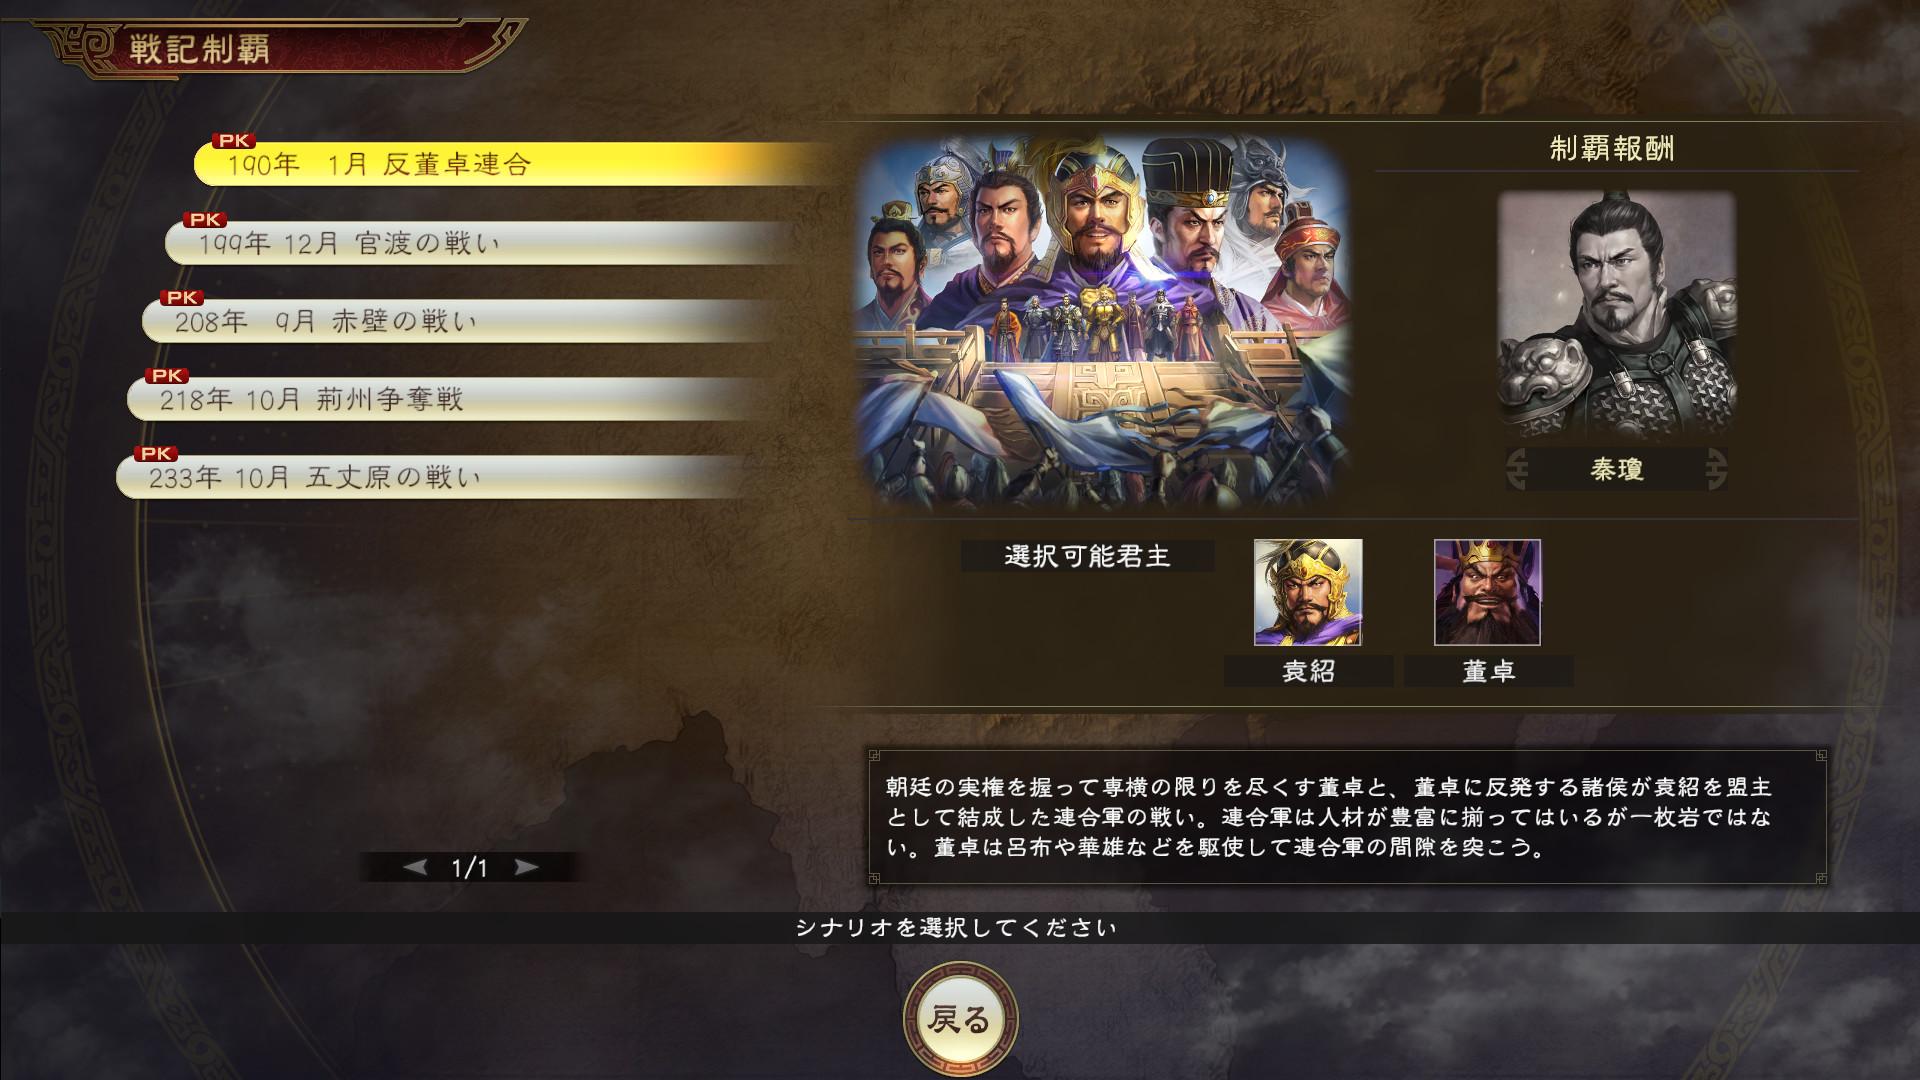 ROMANCE OF THE THREE KINGDOMS XIV: Diplomacy and Strategy Expansion Pack PC Fiyatları